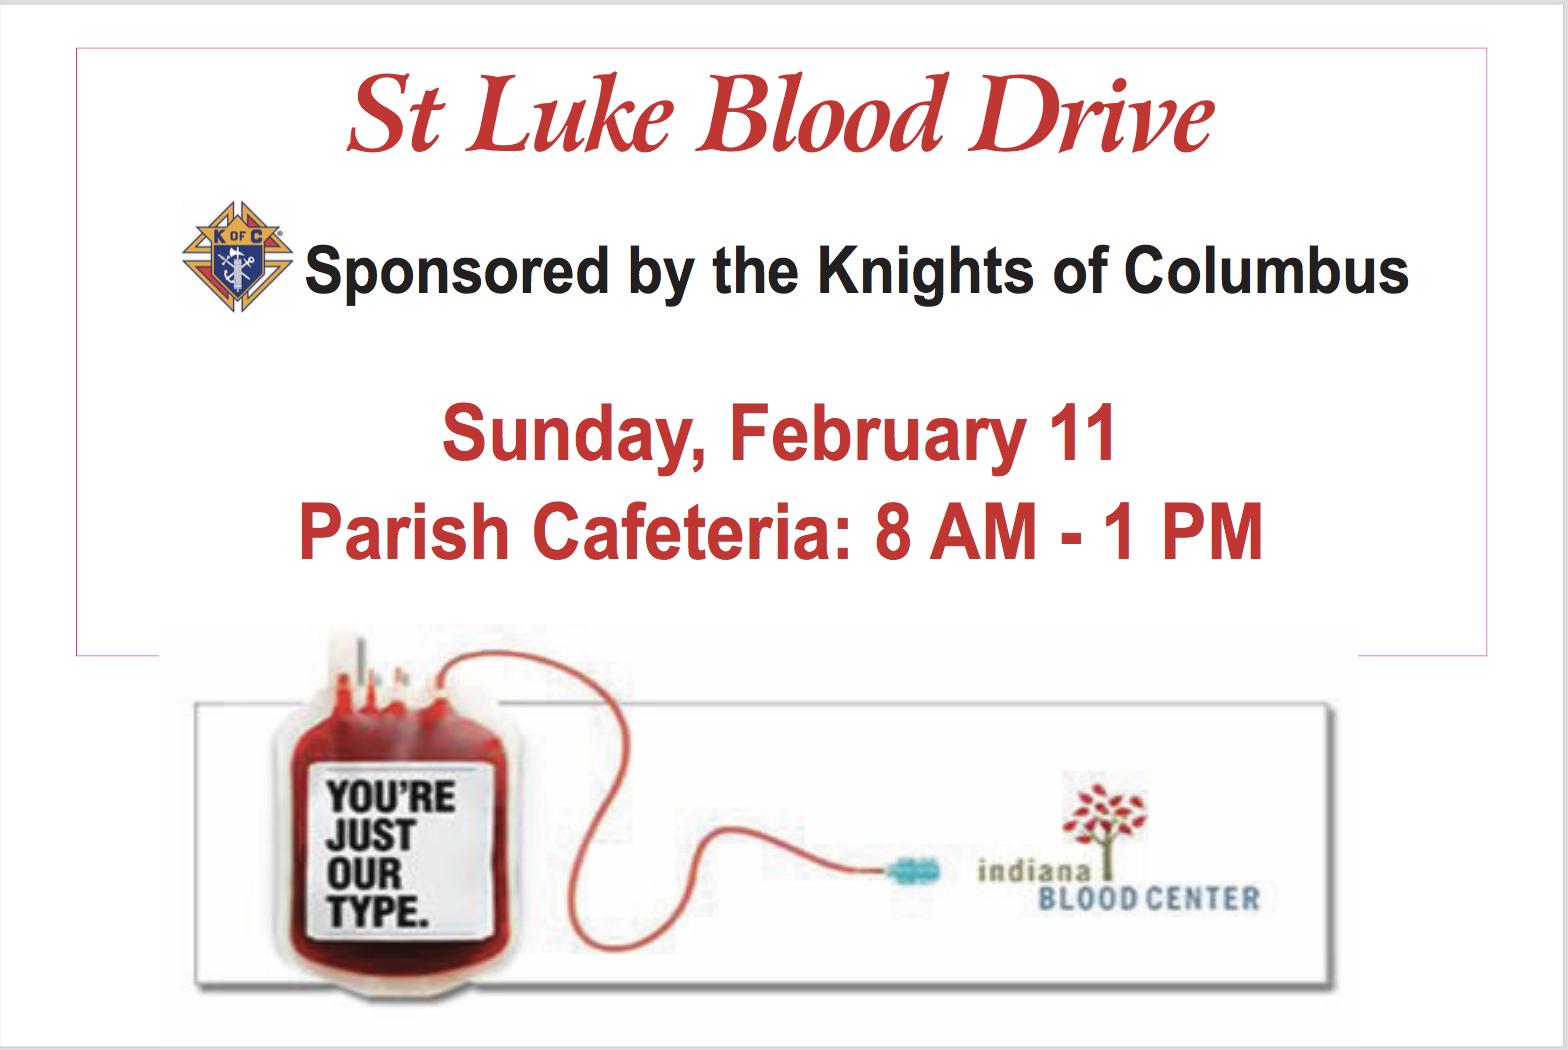 St. Luke Blood Drive - Sponsored by Knights of Columbus